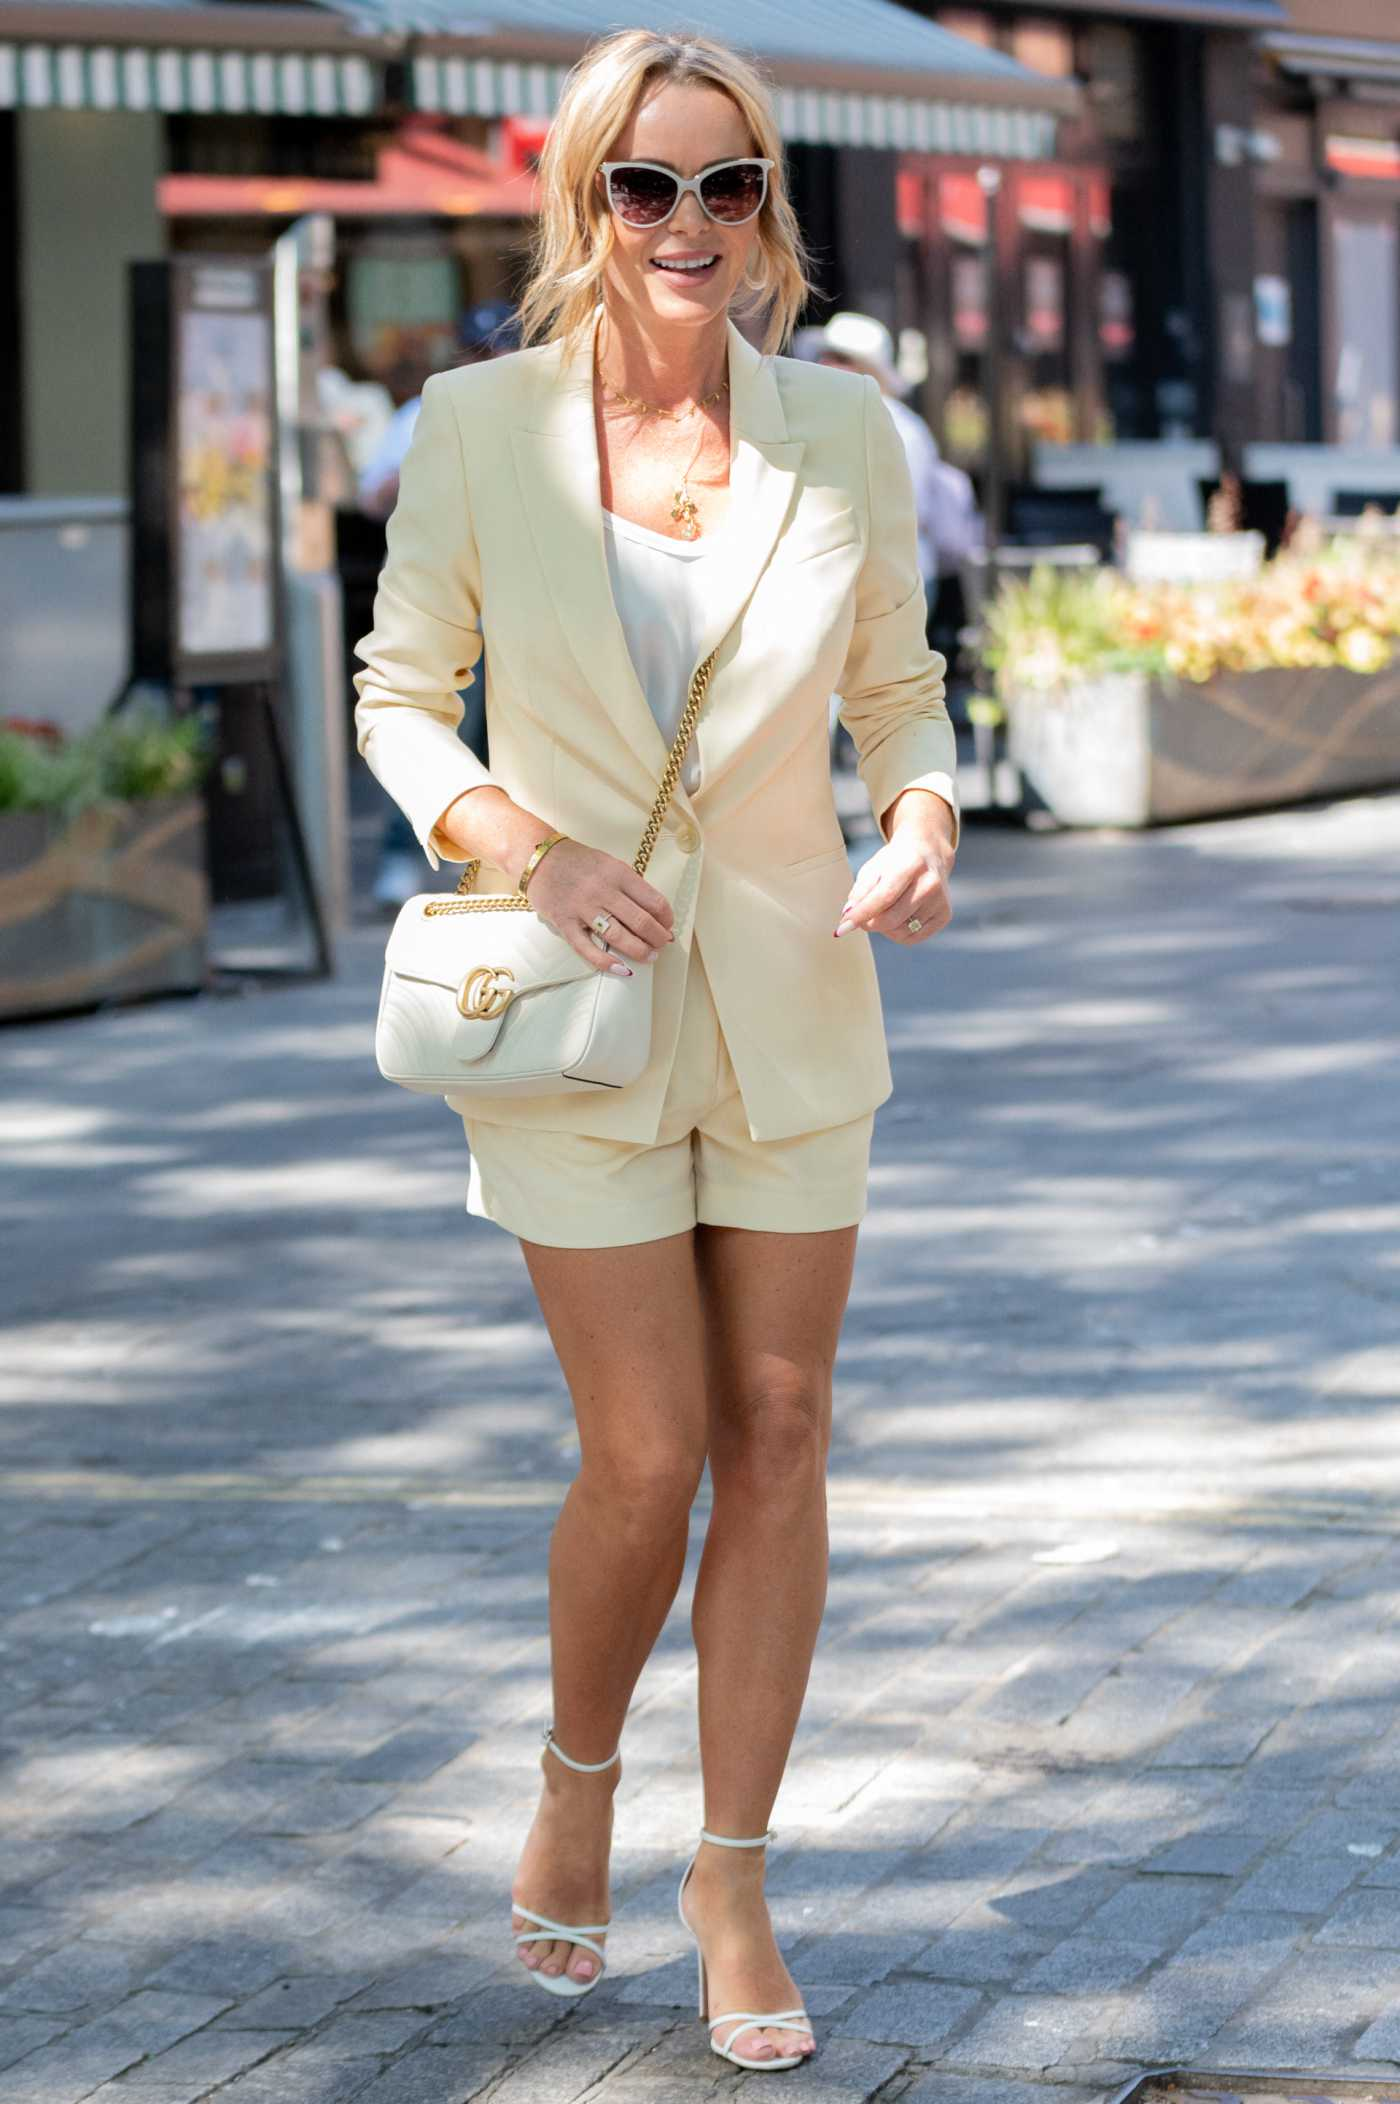 Amanda Holden in a White Blazer Leaves the Global Studios in London 06/14/2021